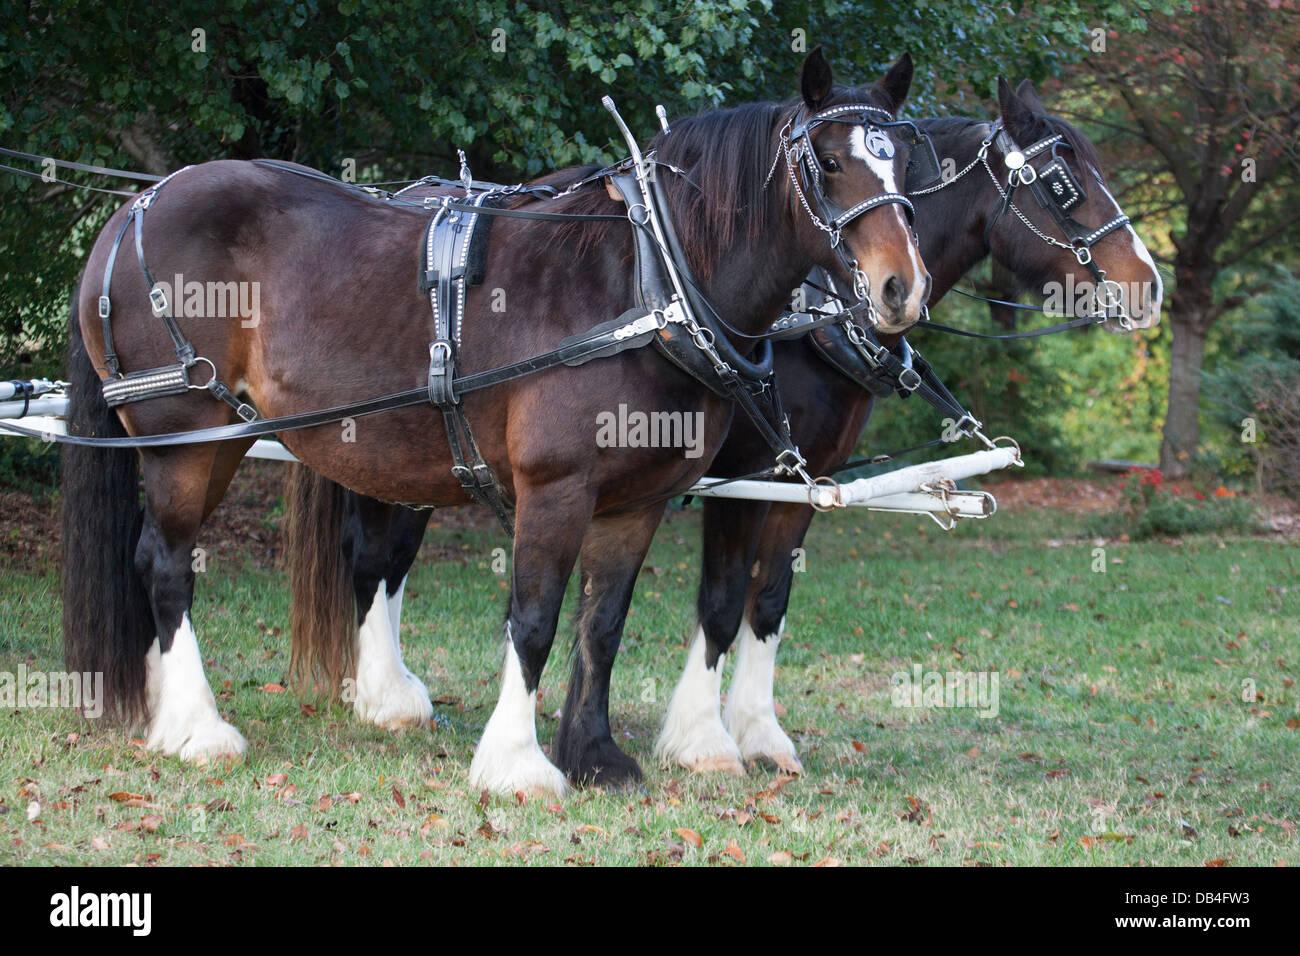 Draught horses (Clydesdale/Gelderlander) in harness - Stock Image